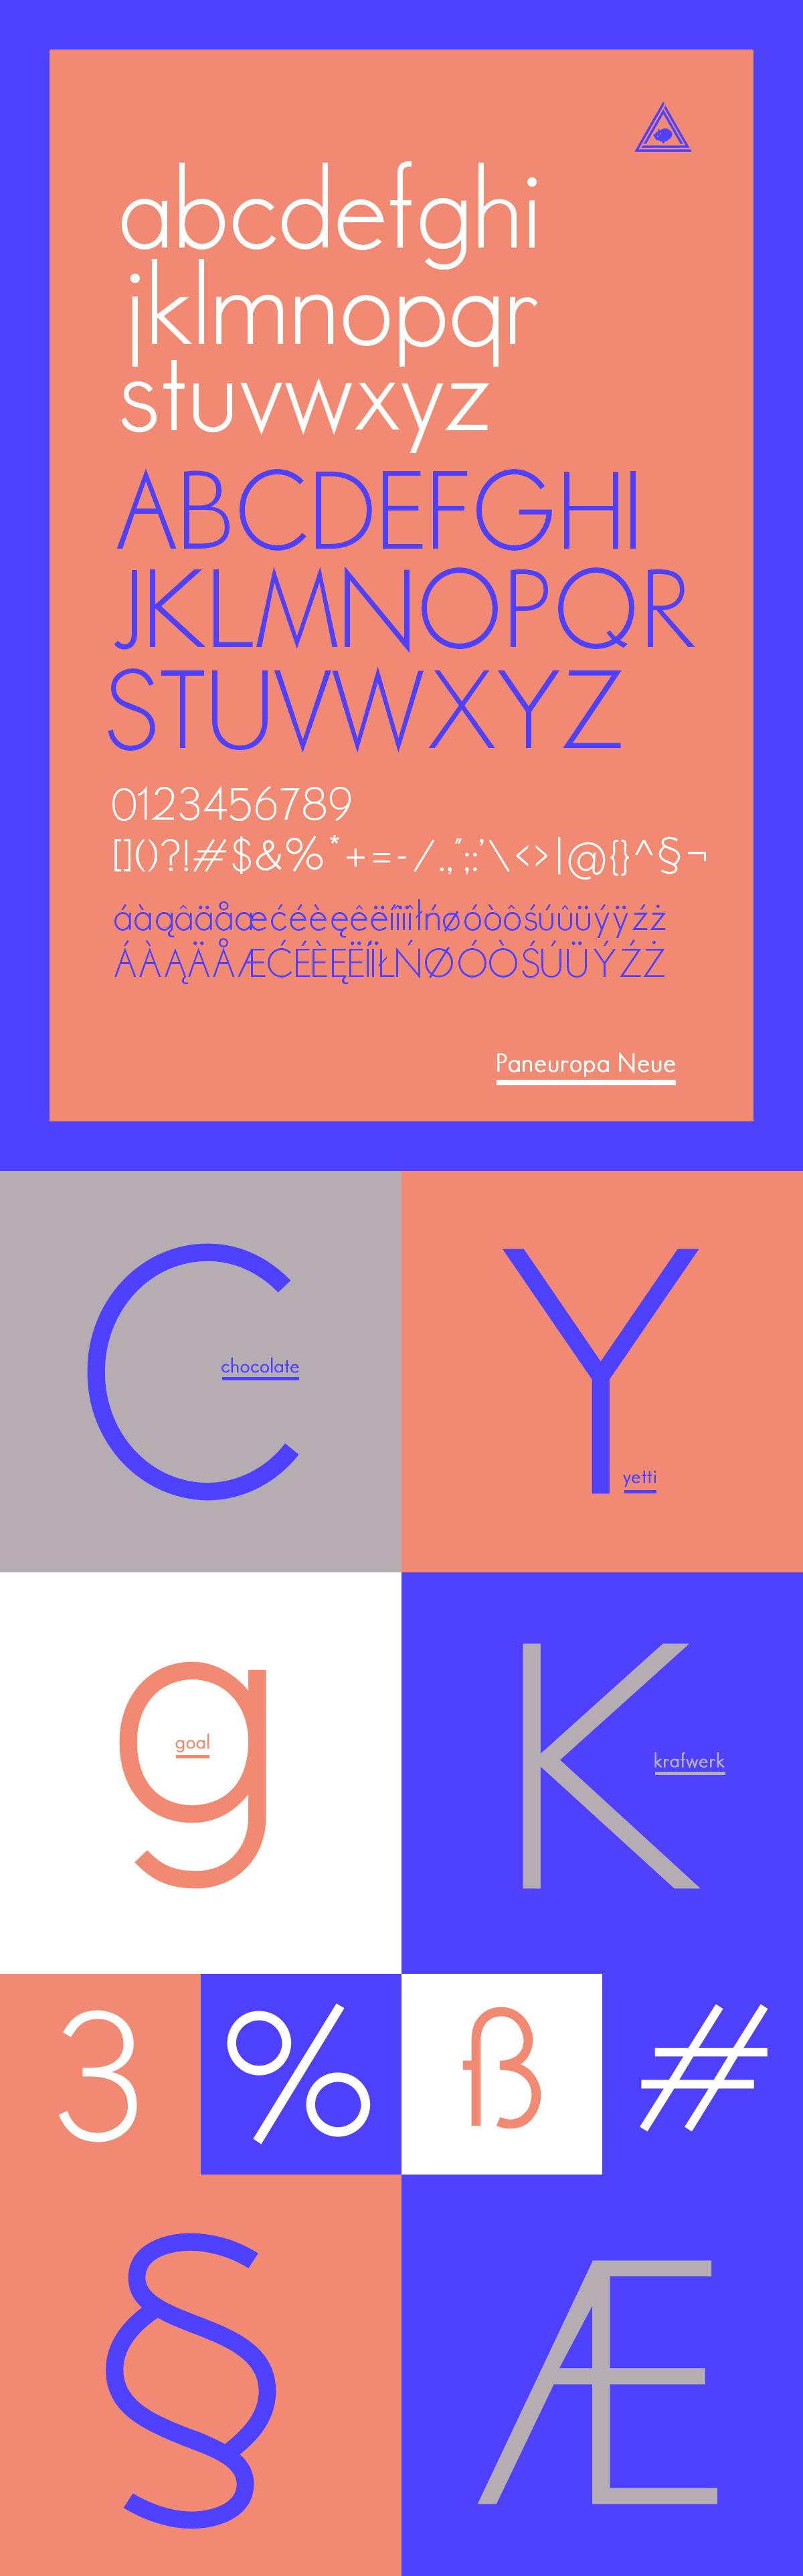 Paneuropa-Neue-free-font